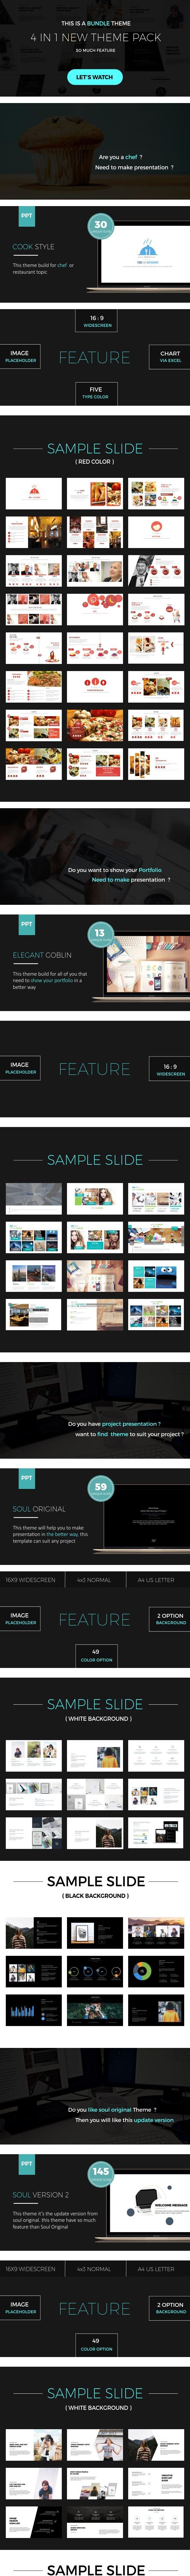 4 Presentation Bundle - Creative PowerPoint Templates